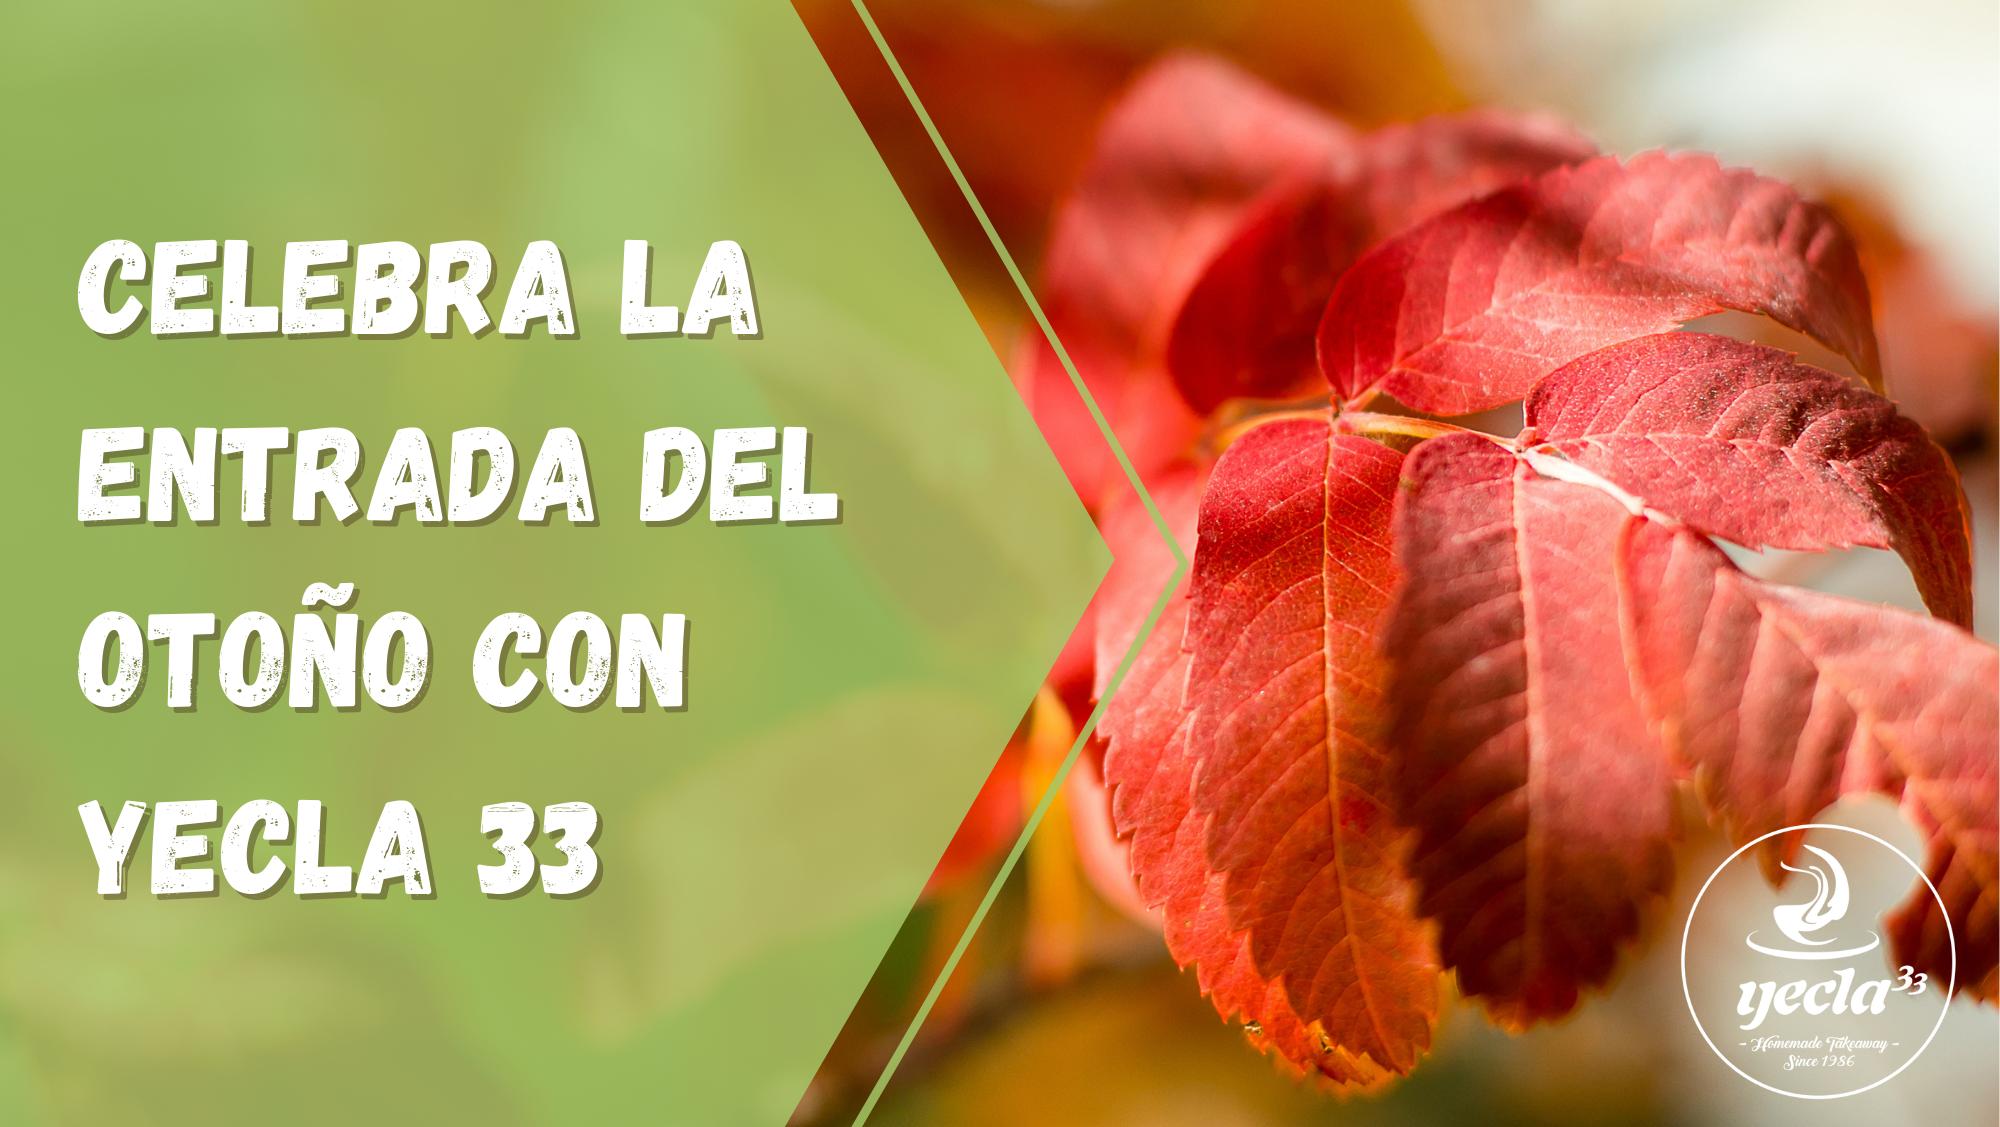 Celebra la entrada del otoño con Yecla 33